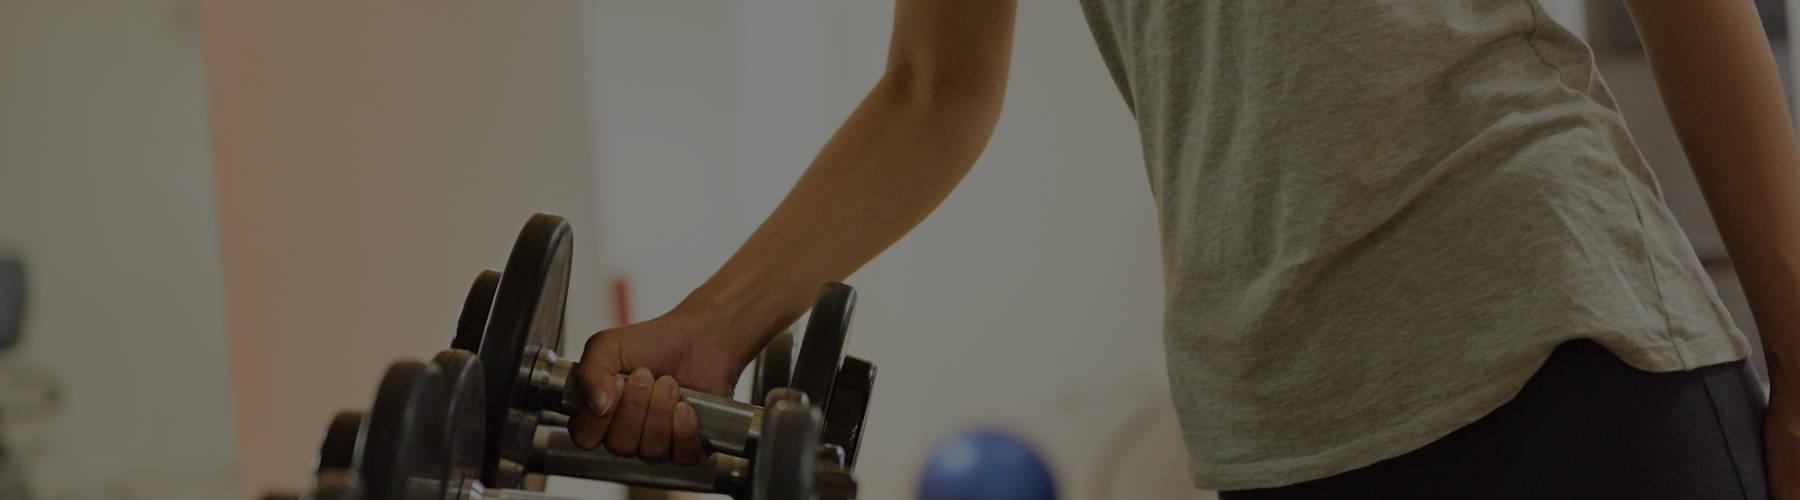 shoulder training mistakes